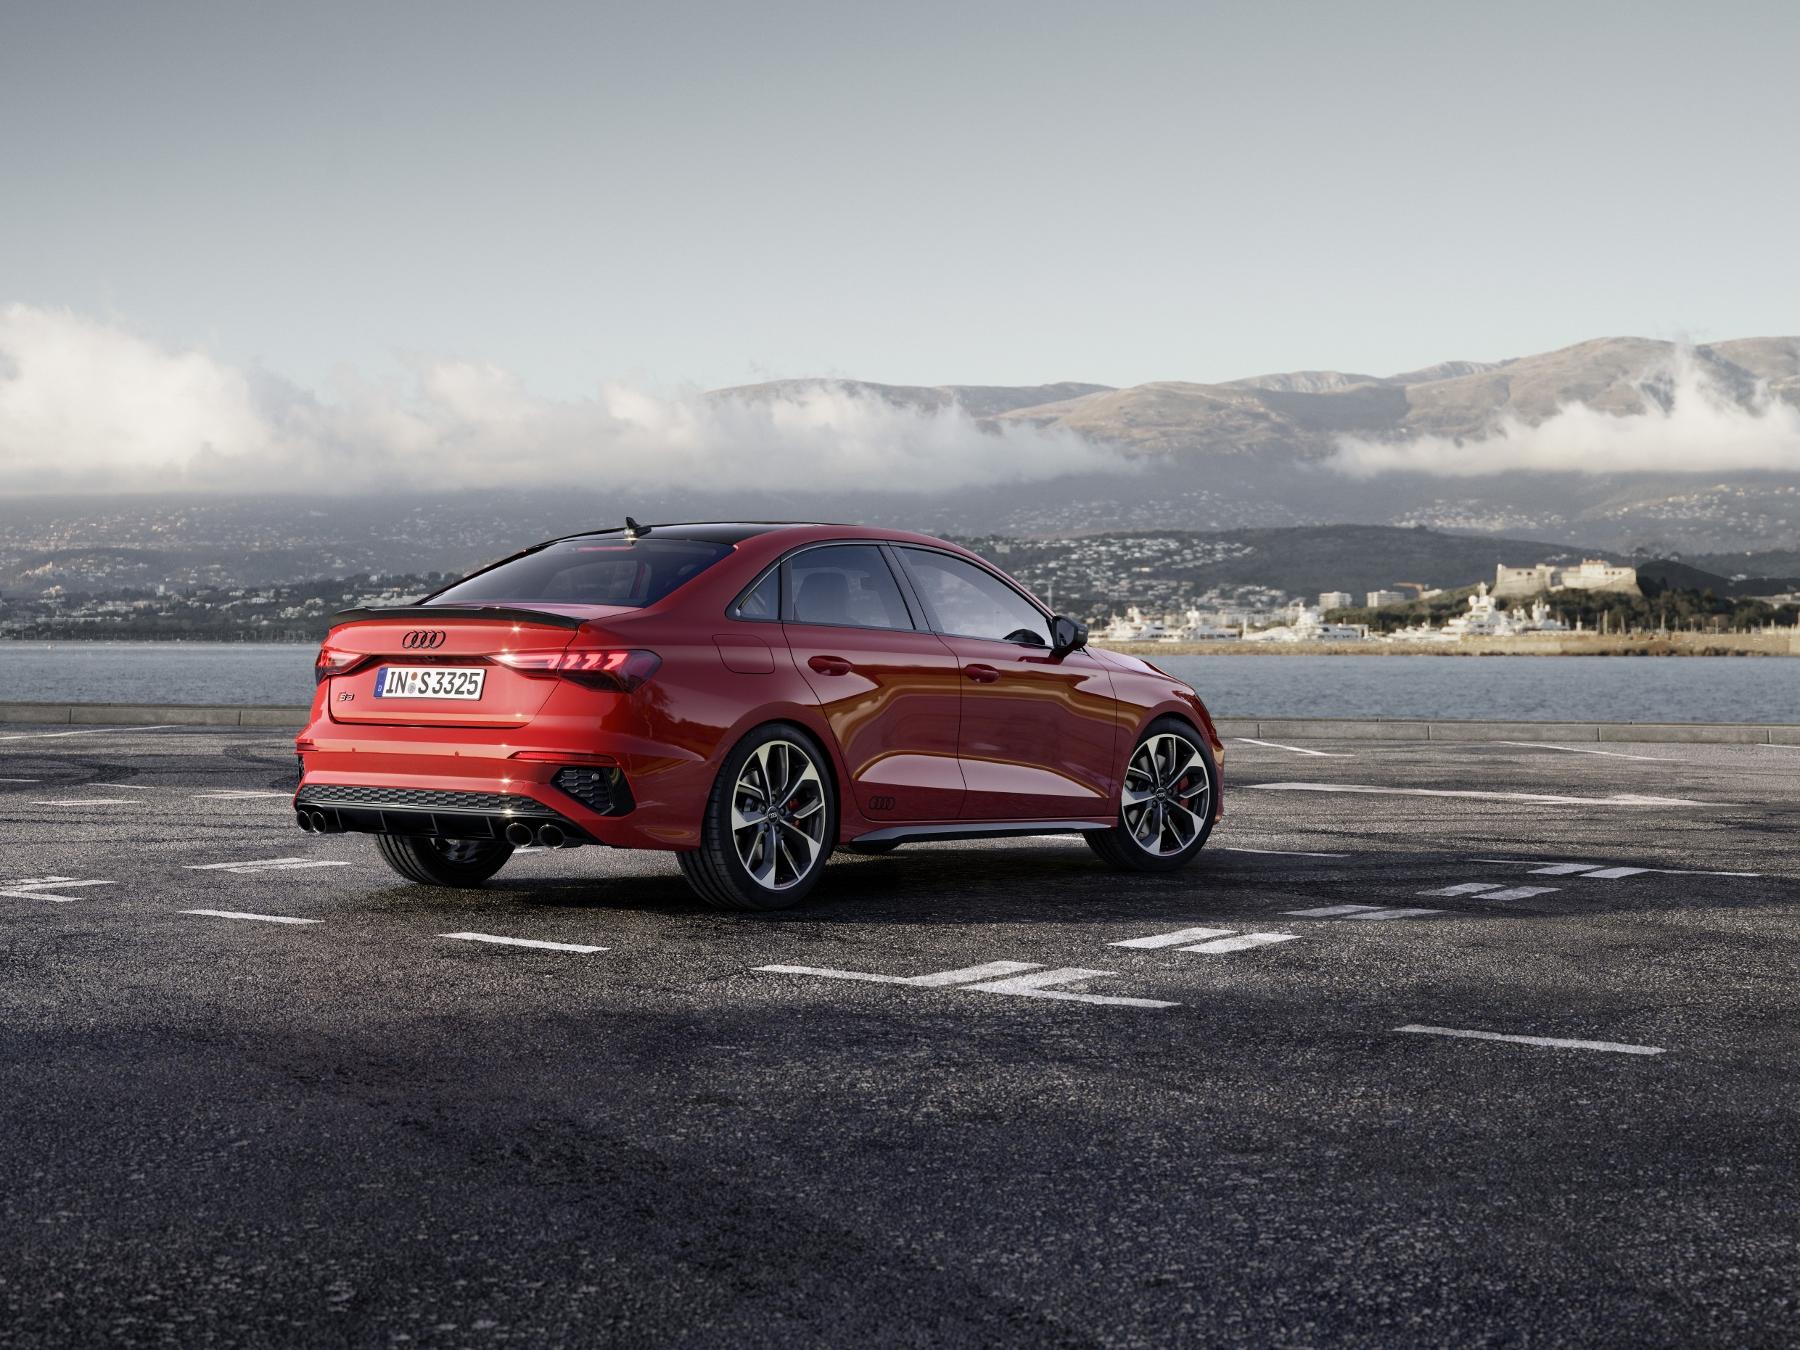 Audi ukázalo modely S3 Sedan a Sportback. Prezradilo aj nemeckú cenu Xgms3POISJ a204368large-1800x13